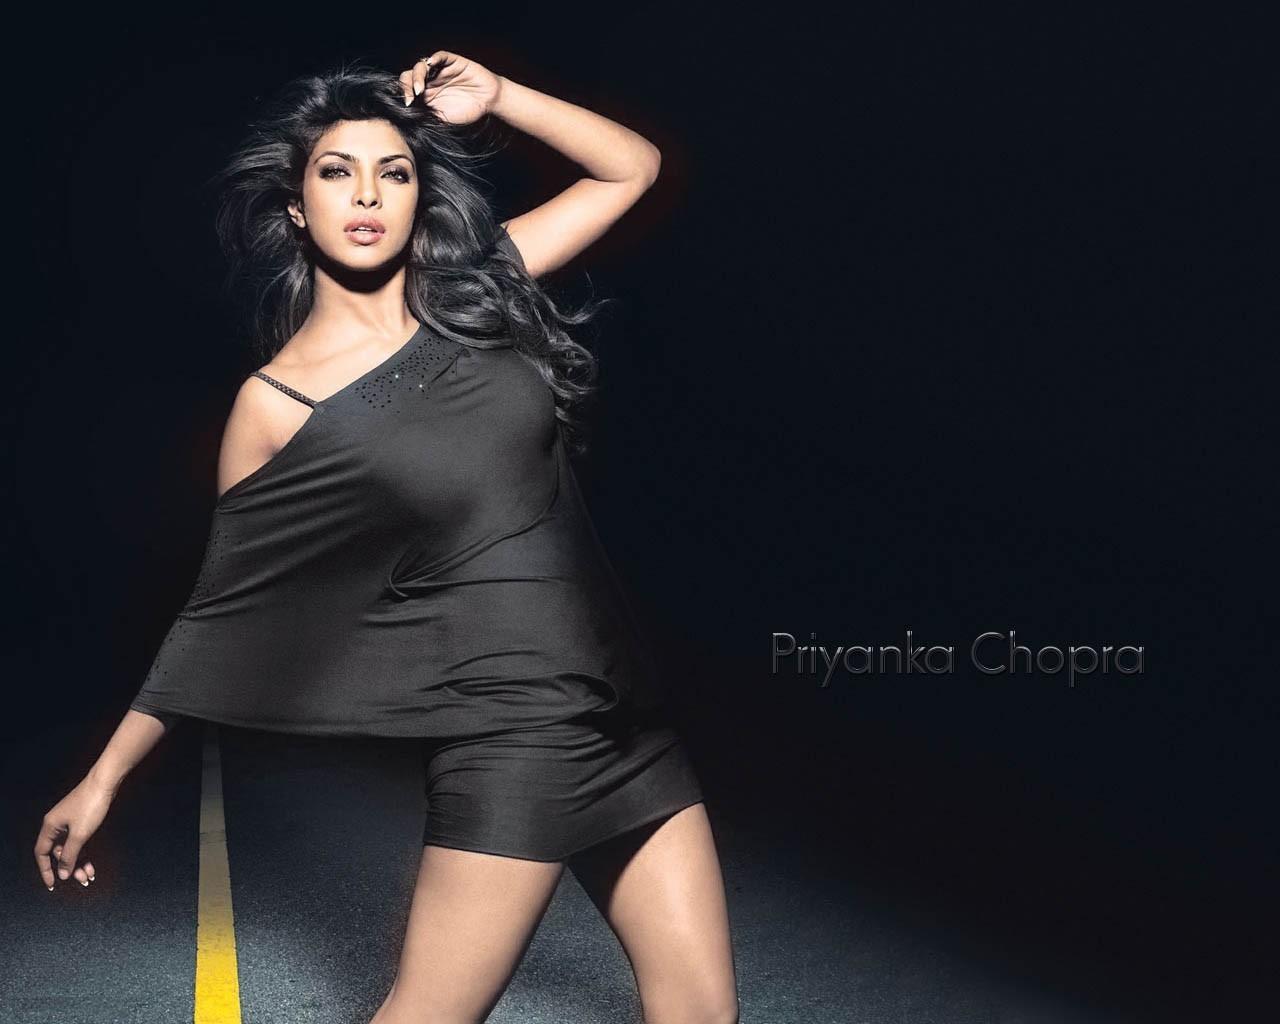 http://3.bp.blogspot.com/-rDH2PkWtPZ0/TuOVVWi0wLI/AAAAAAAADAM/oUPIw721BcY/s1600/Don2_Priyanka_chopra_wallpapers.jpg